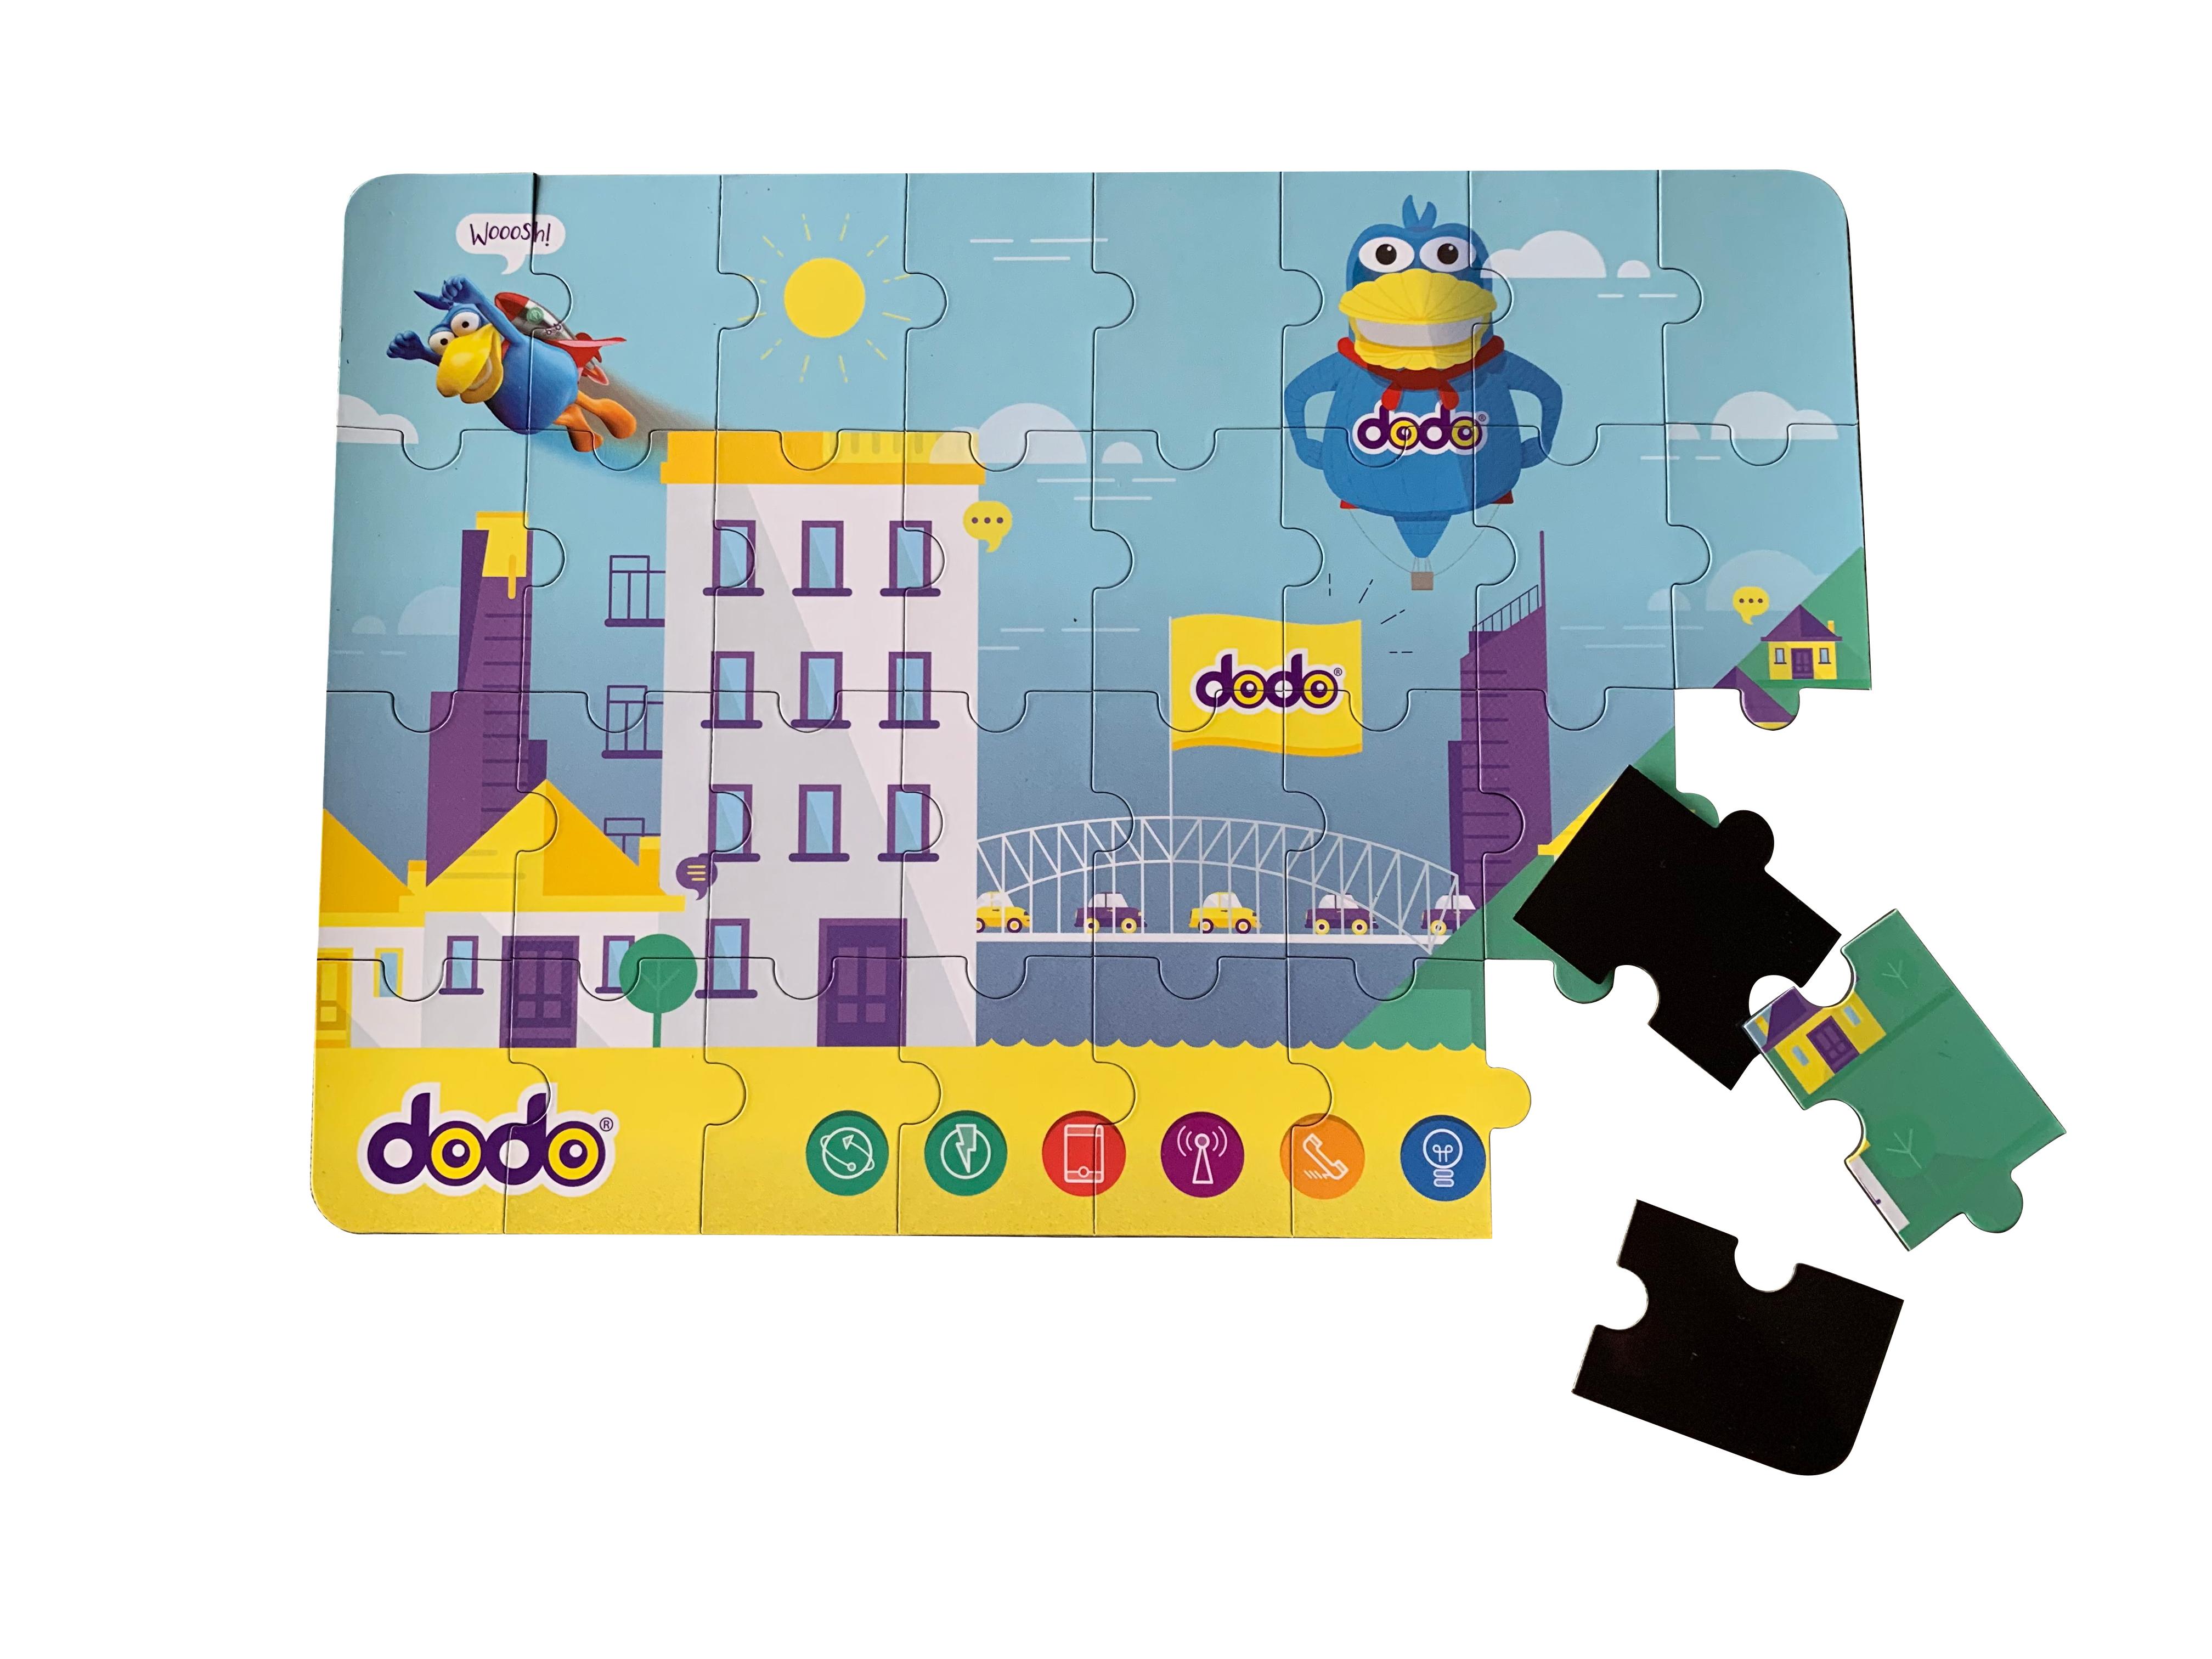 refrigerator magnets custom jigsaw puzzles cartoon decorative magnets for refrigerator